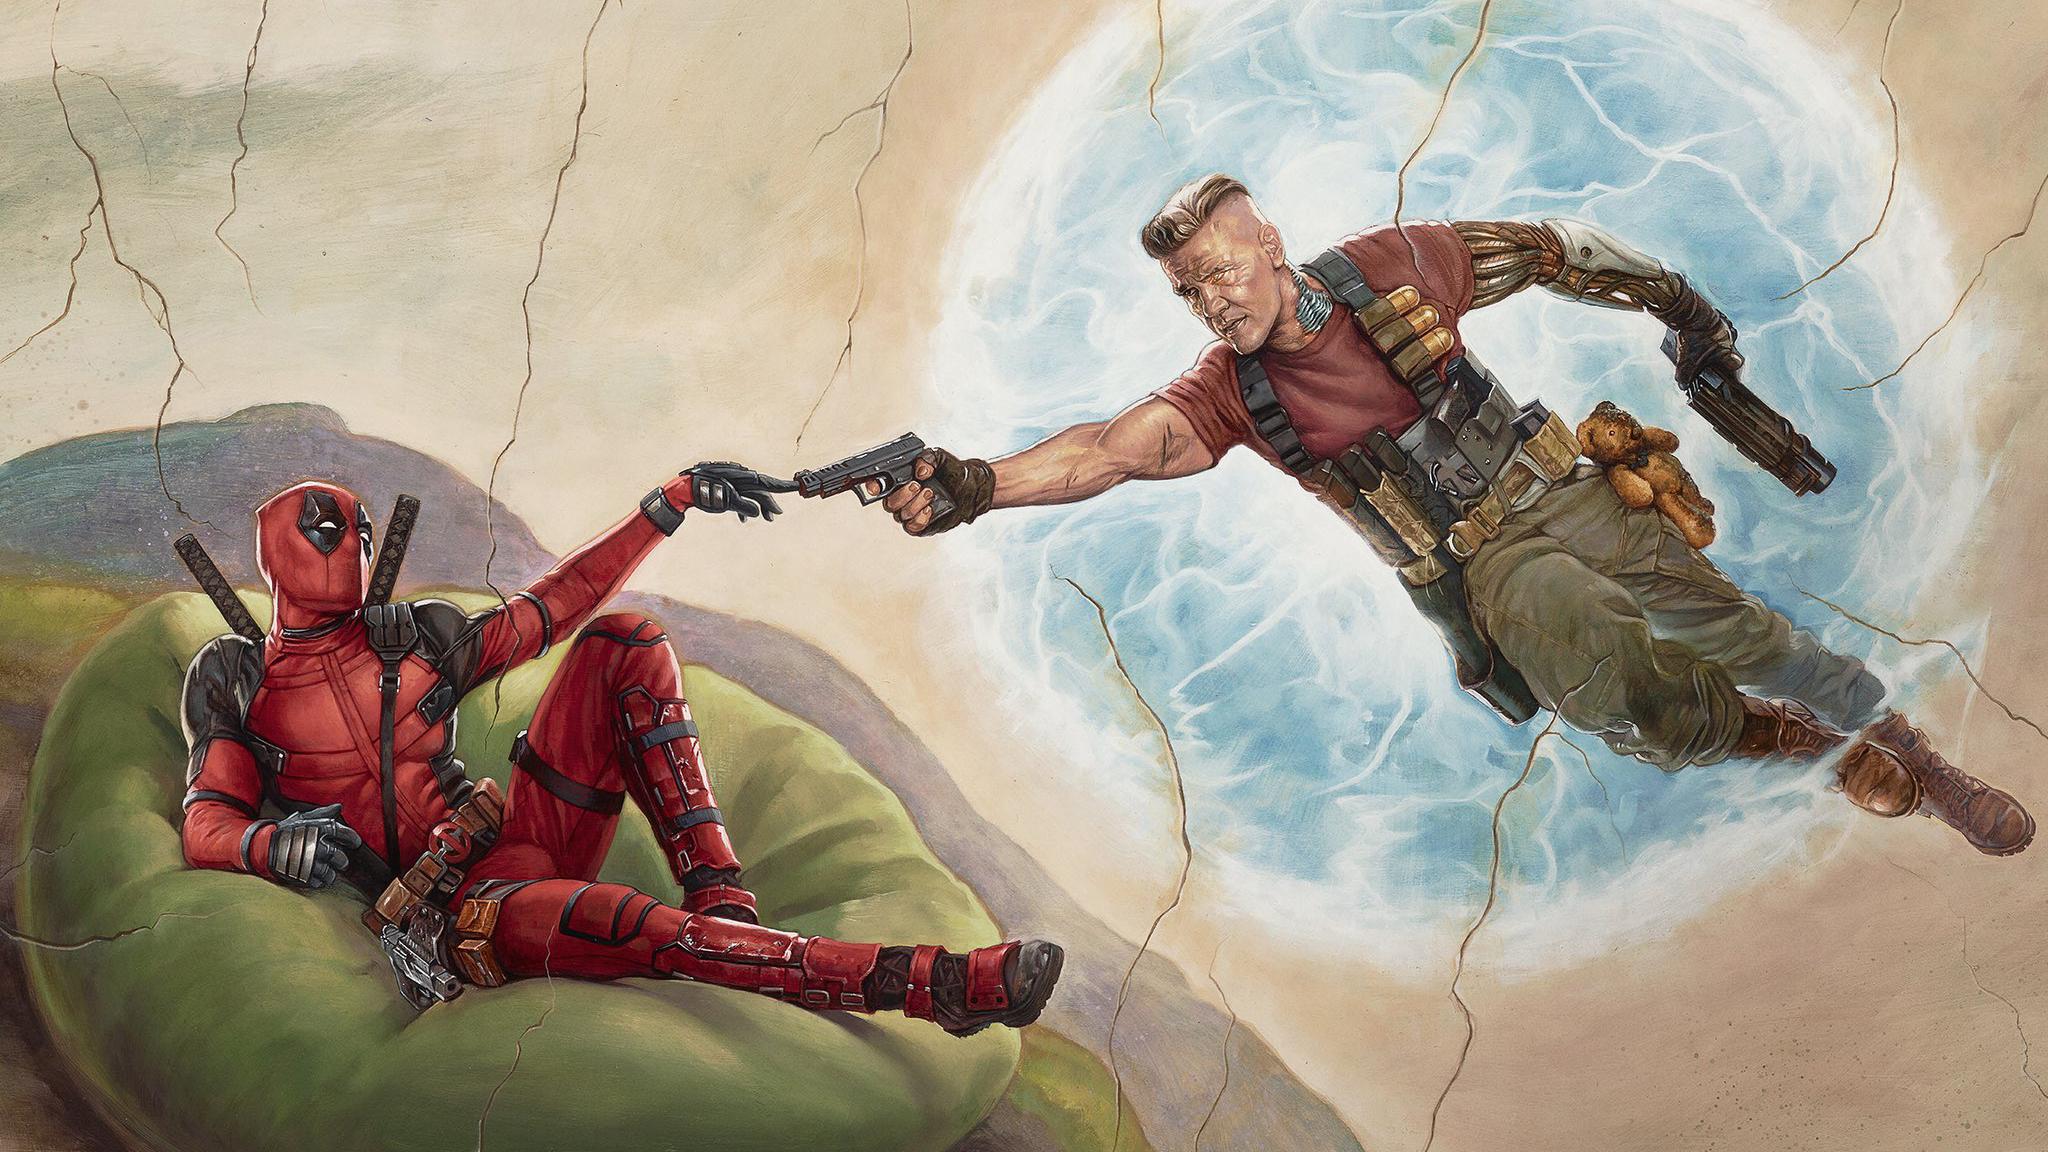 2048x1152 Deadpool 2 2018 Movie Poster 2048x1152 Resolution Hd 4k